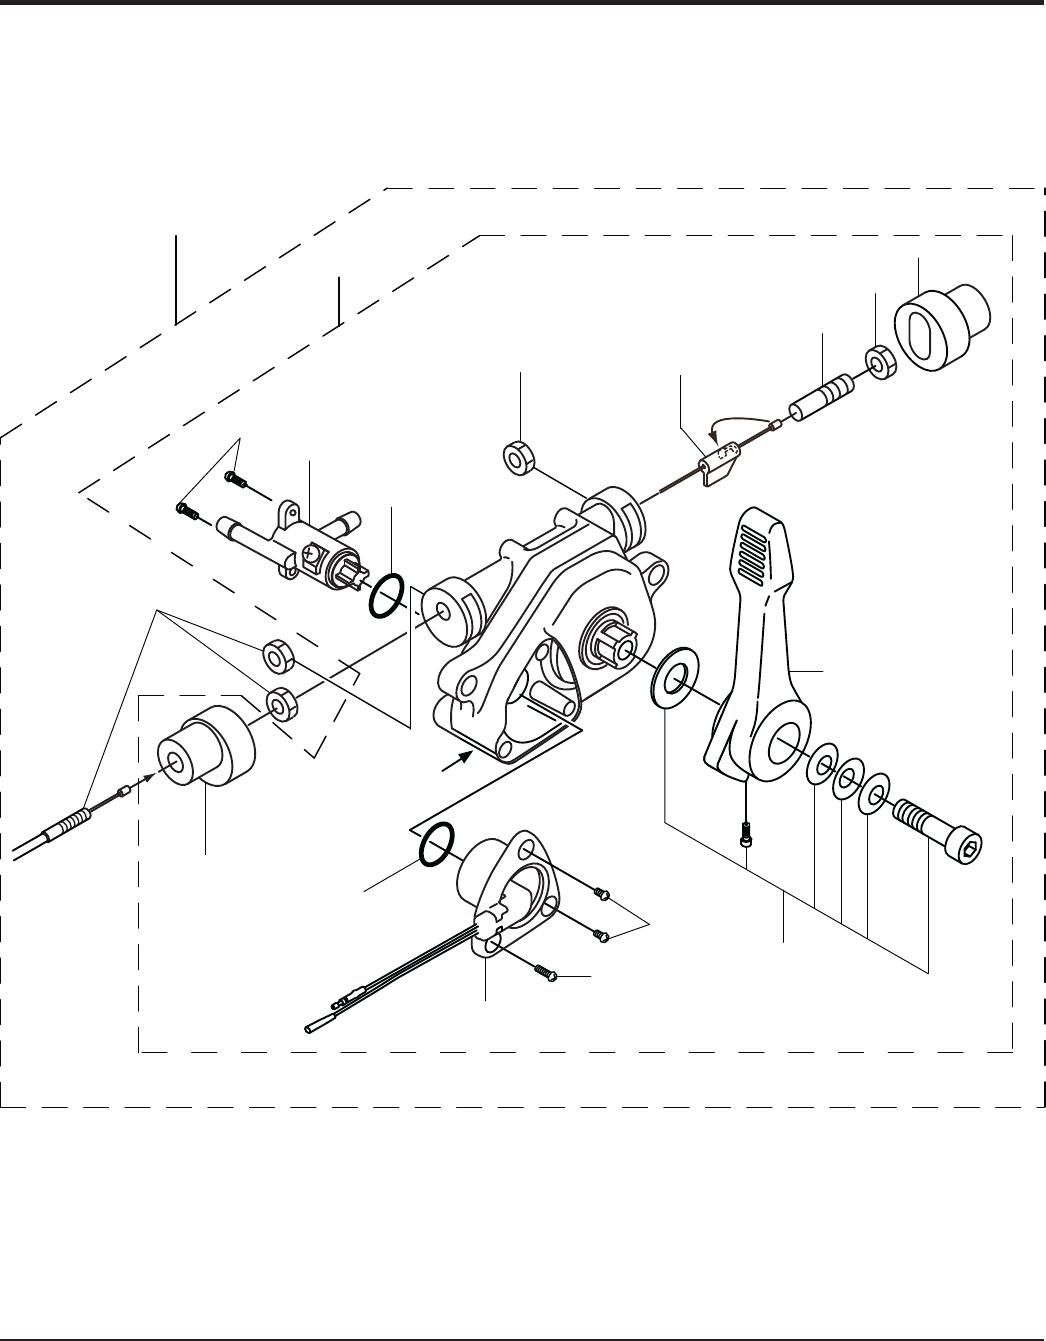 multiquip mikasa serie o mtx70hd apisonador gx100ukrbf users manual Hifonics Wiring Diagram p gina 36 apisonador mtx70hd manual de funcionamiento y piezas rev 20 07 12